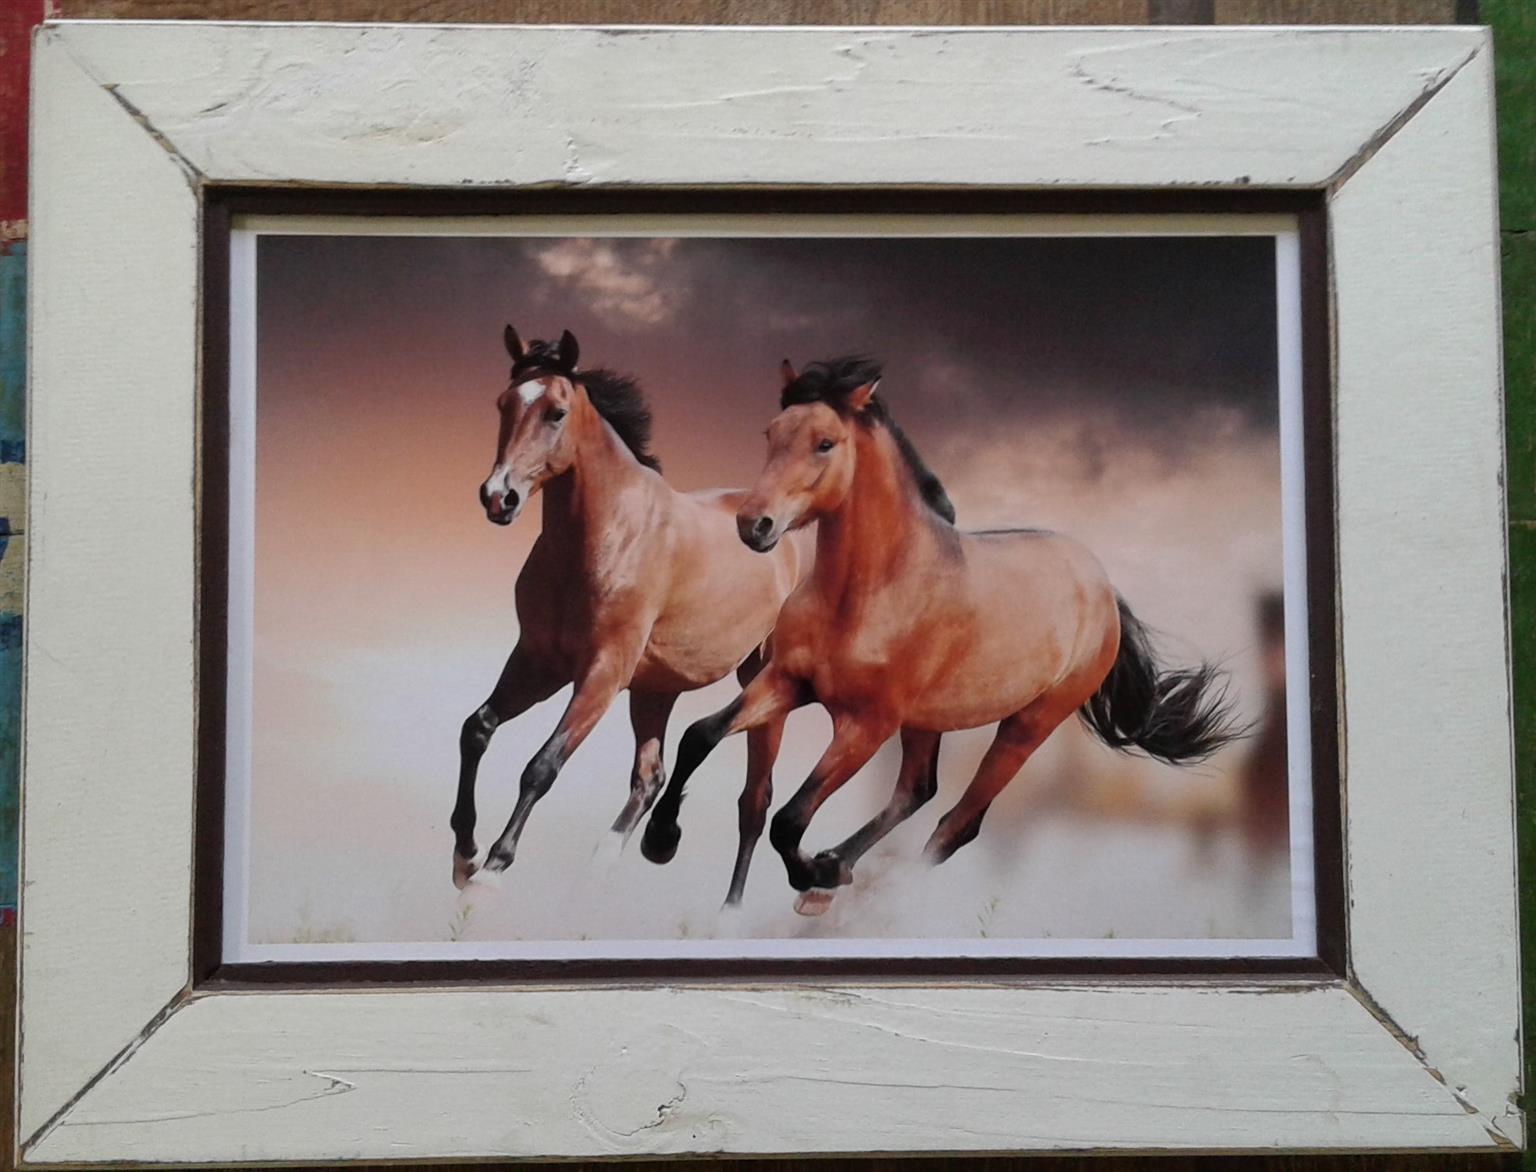 Framed Print: 2 Horses... Home decor. Wall Art.